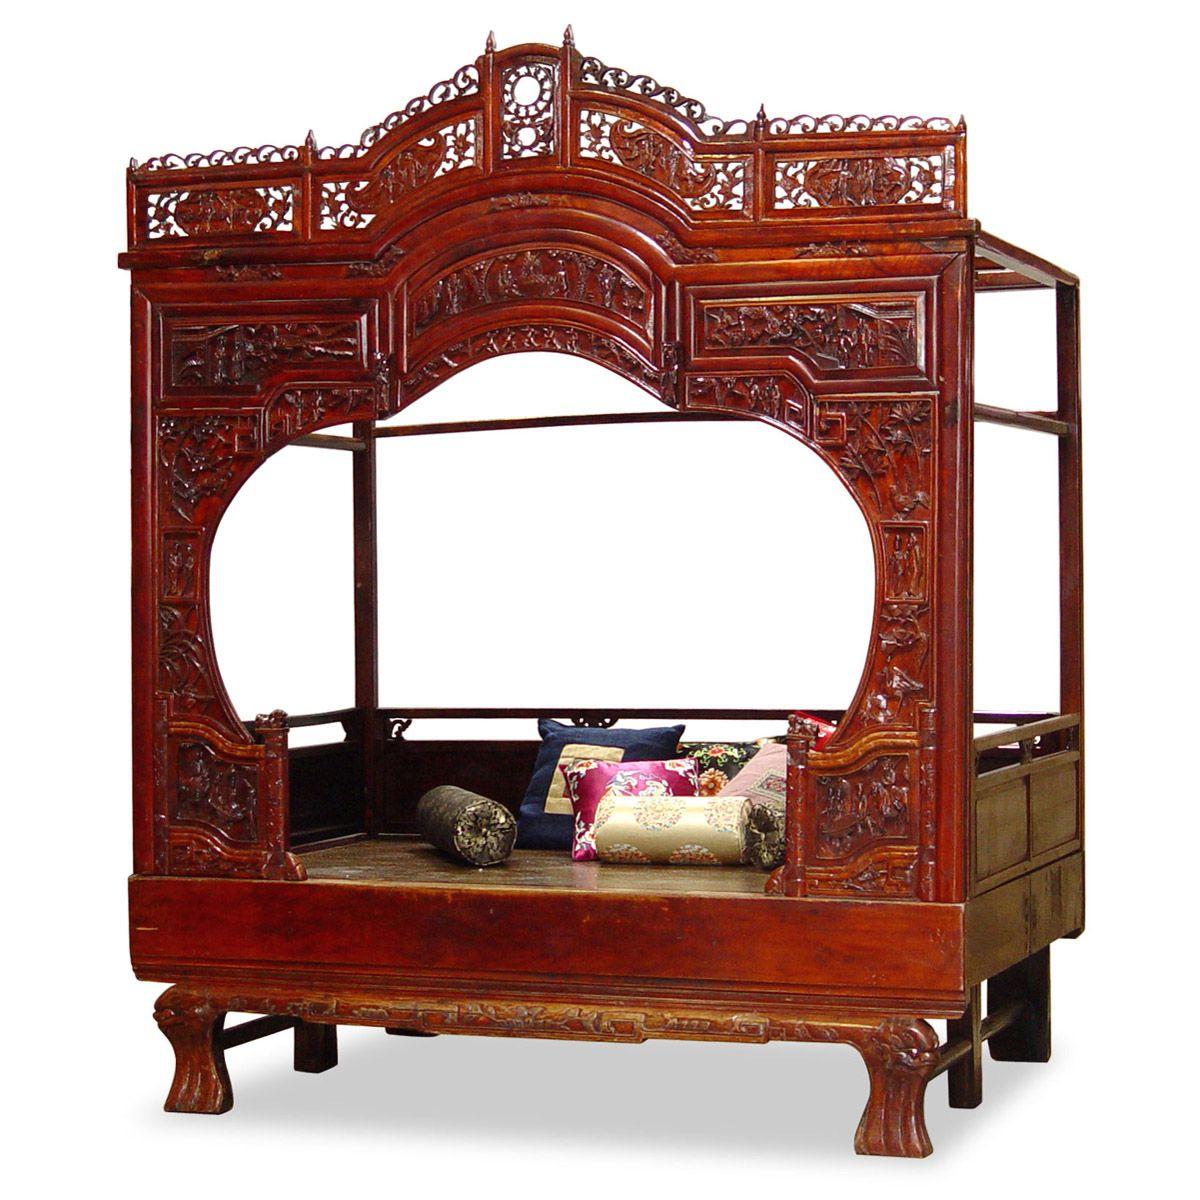 furniture styles originated Asian